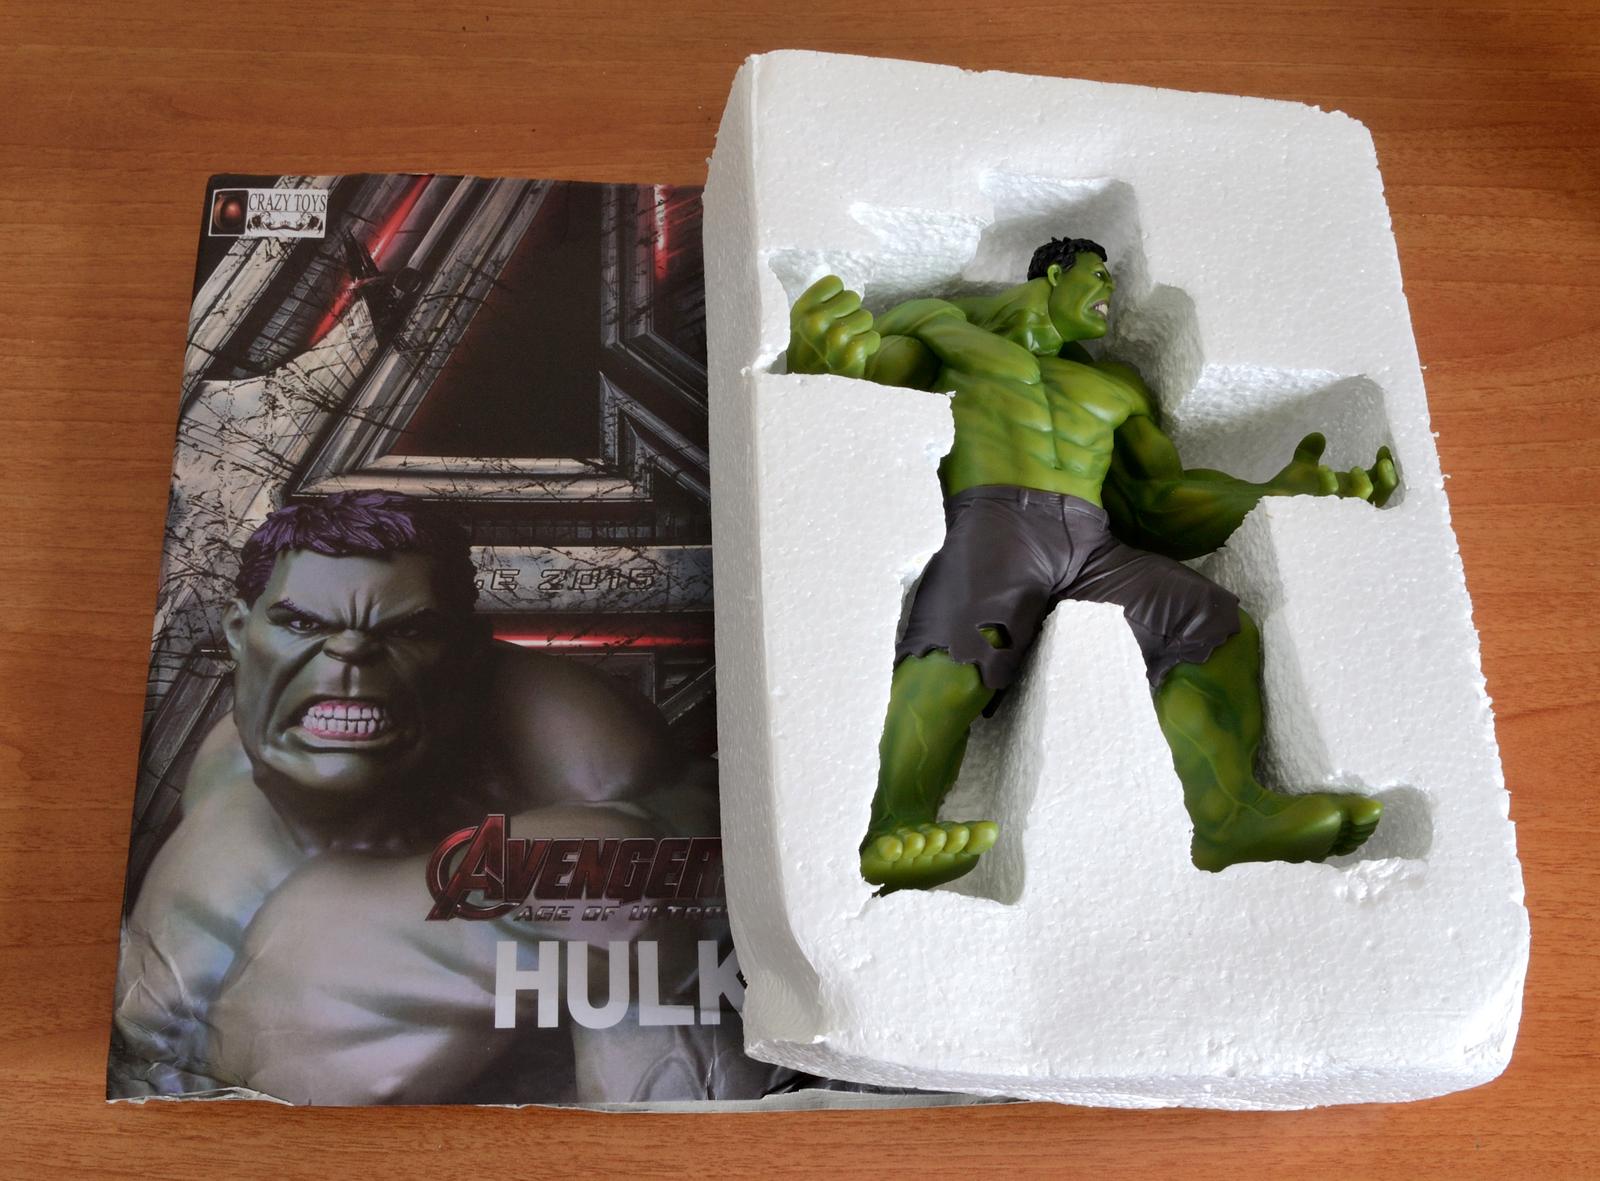 Crazy Toys Avengers - Age of Ultron Hulk Figure - Inner Case